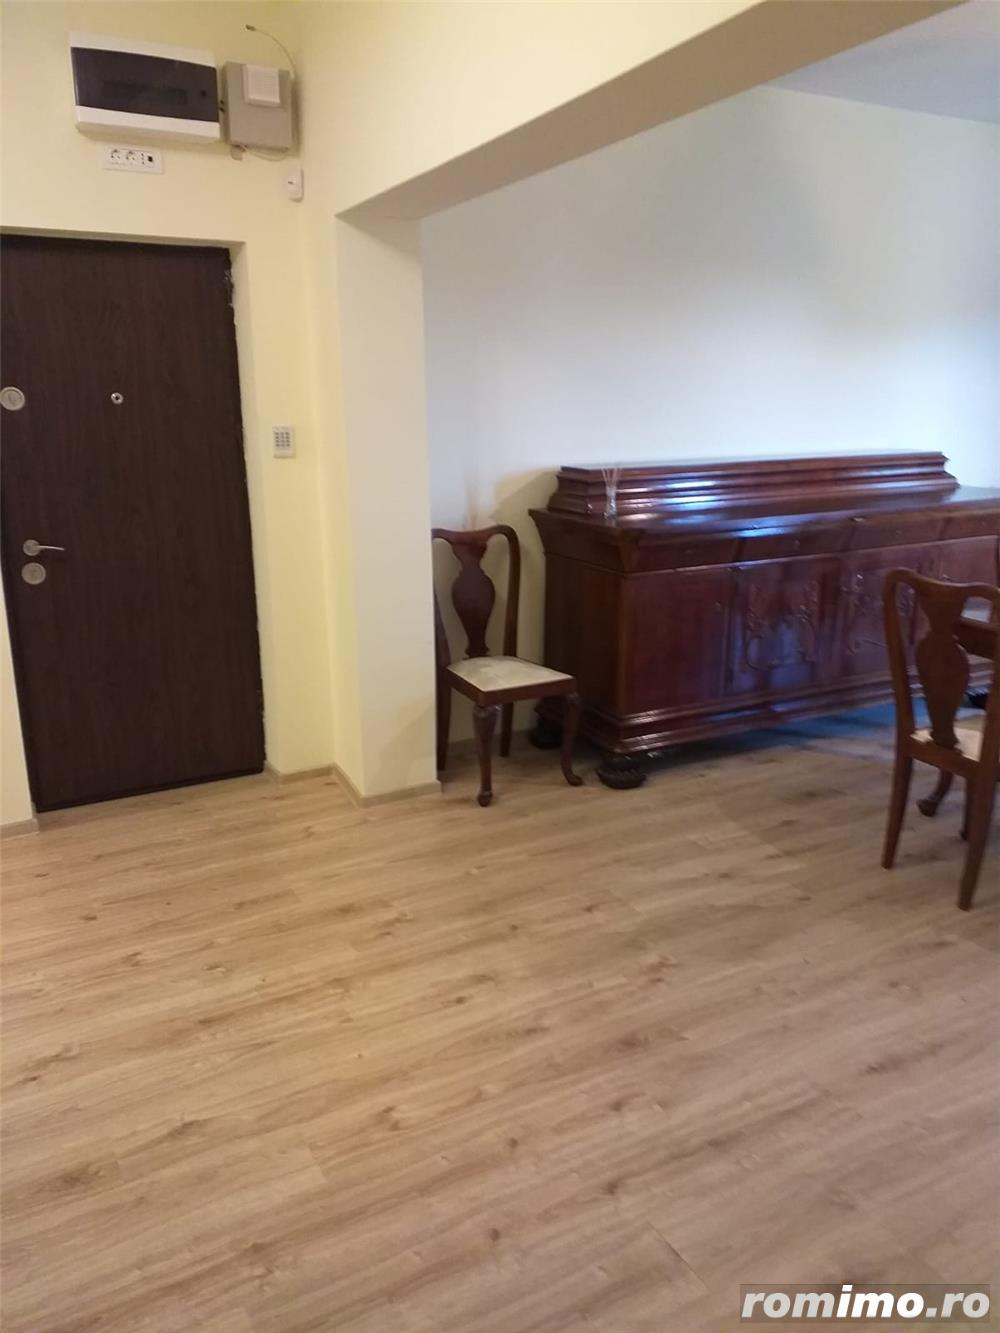 Central - Balcescu, LUX apartament de 95 mp utili,2bai,2balcoane